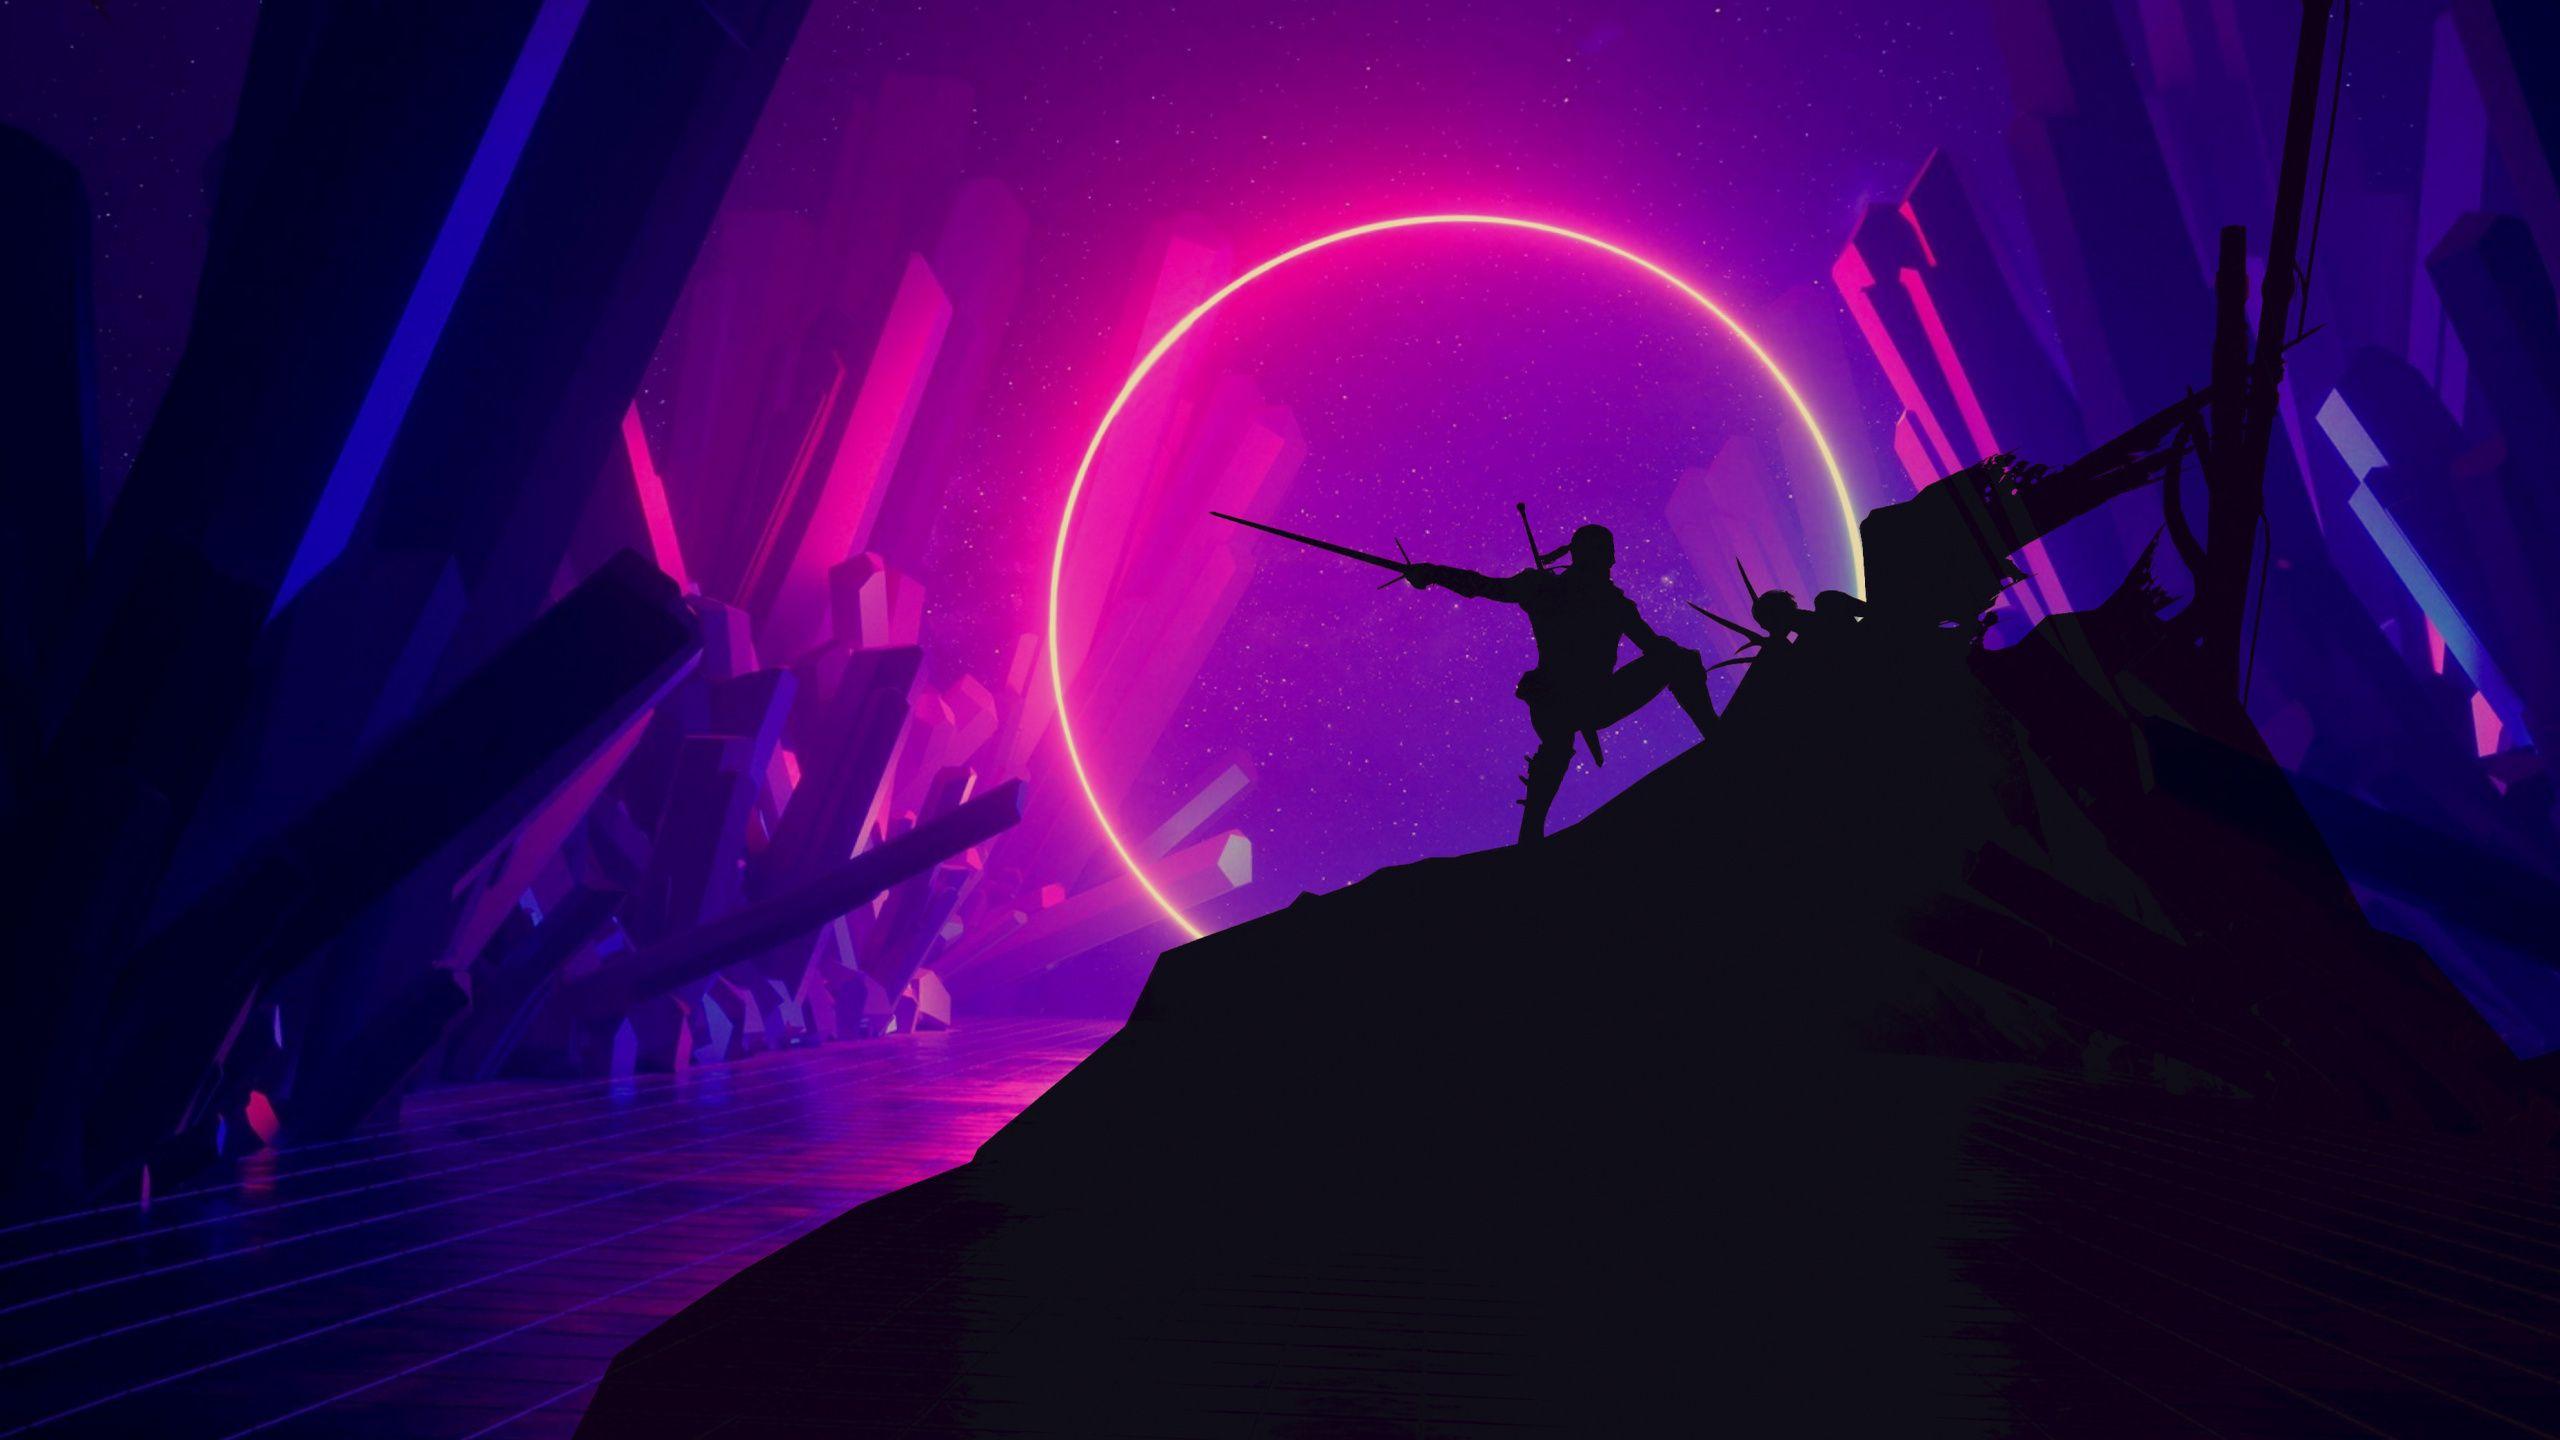 2560x1440 Warrior The Witcher Silhouette Art Wallpaper Gaming Wallpapers Hd The Witcher Art Wallpaper